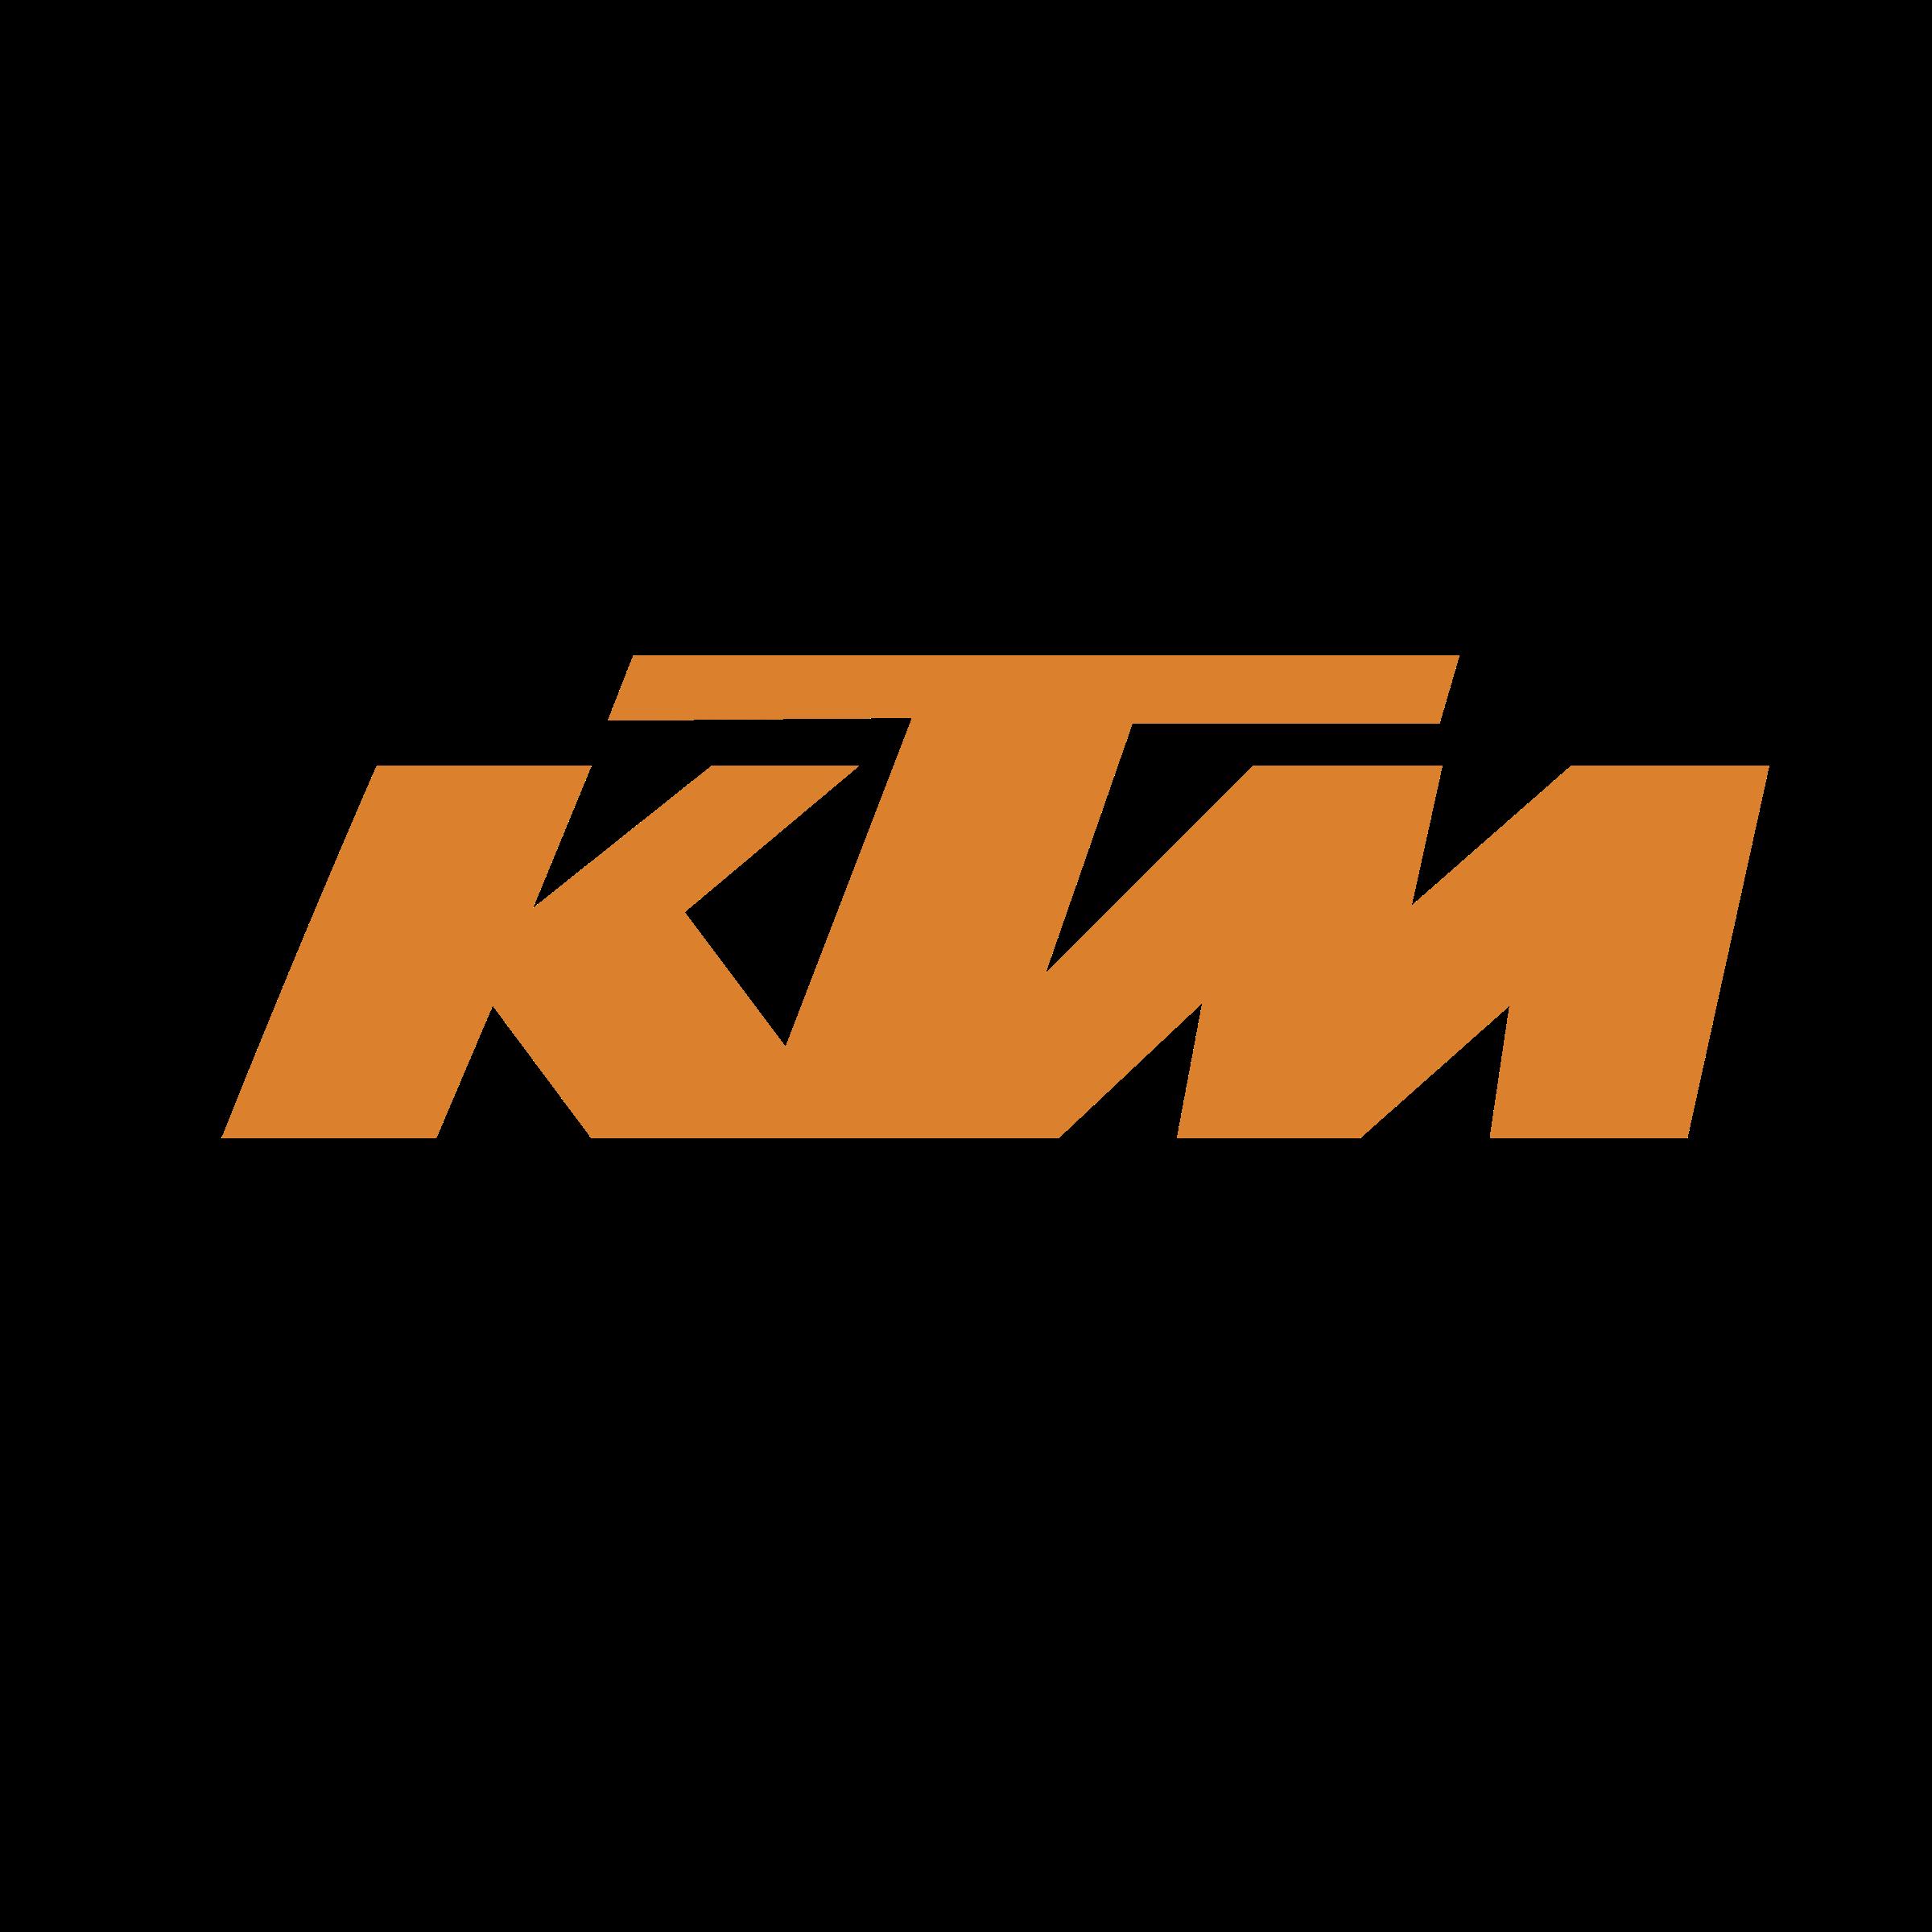 Ktm Racing Logo PNG